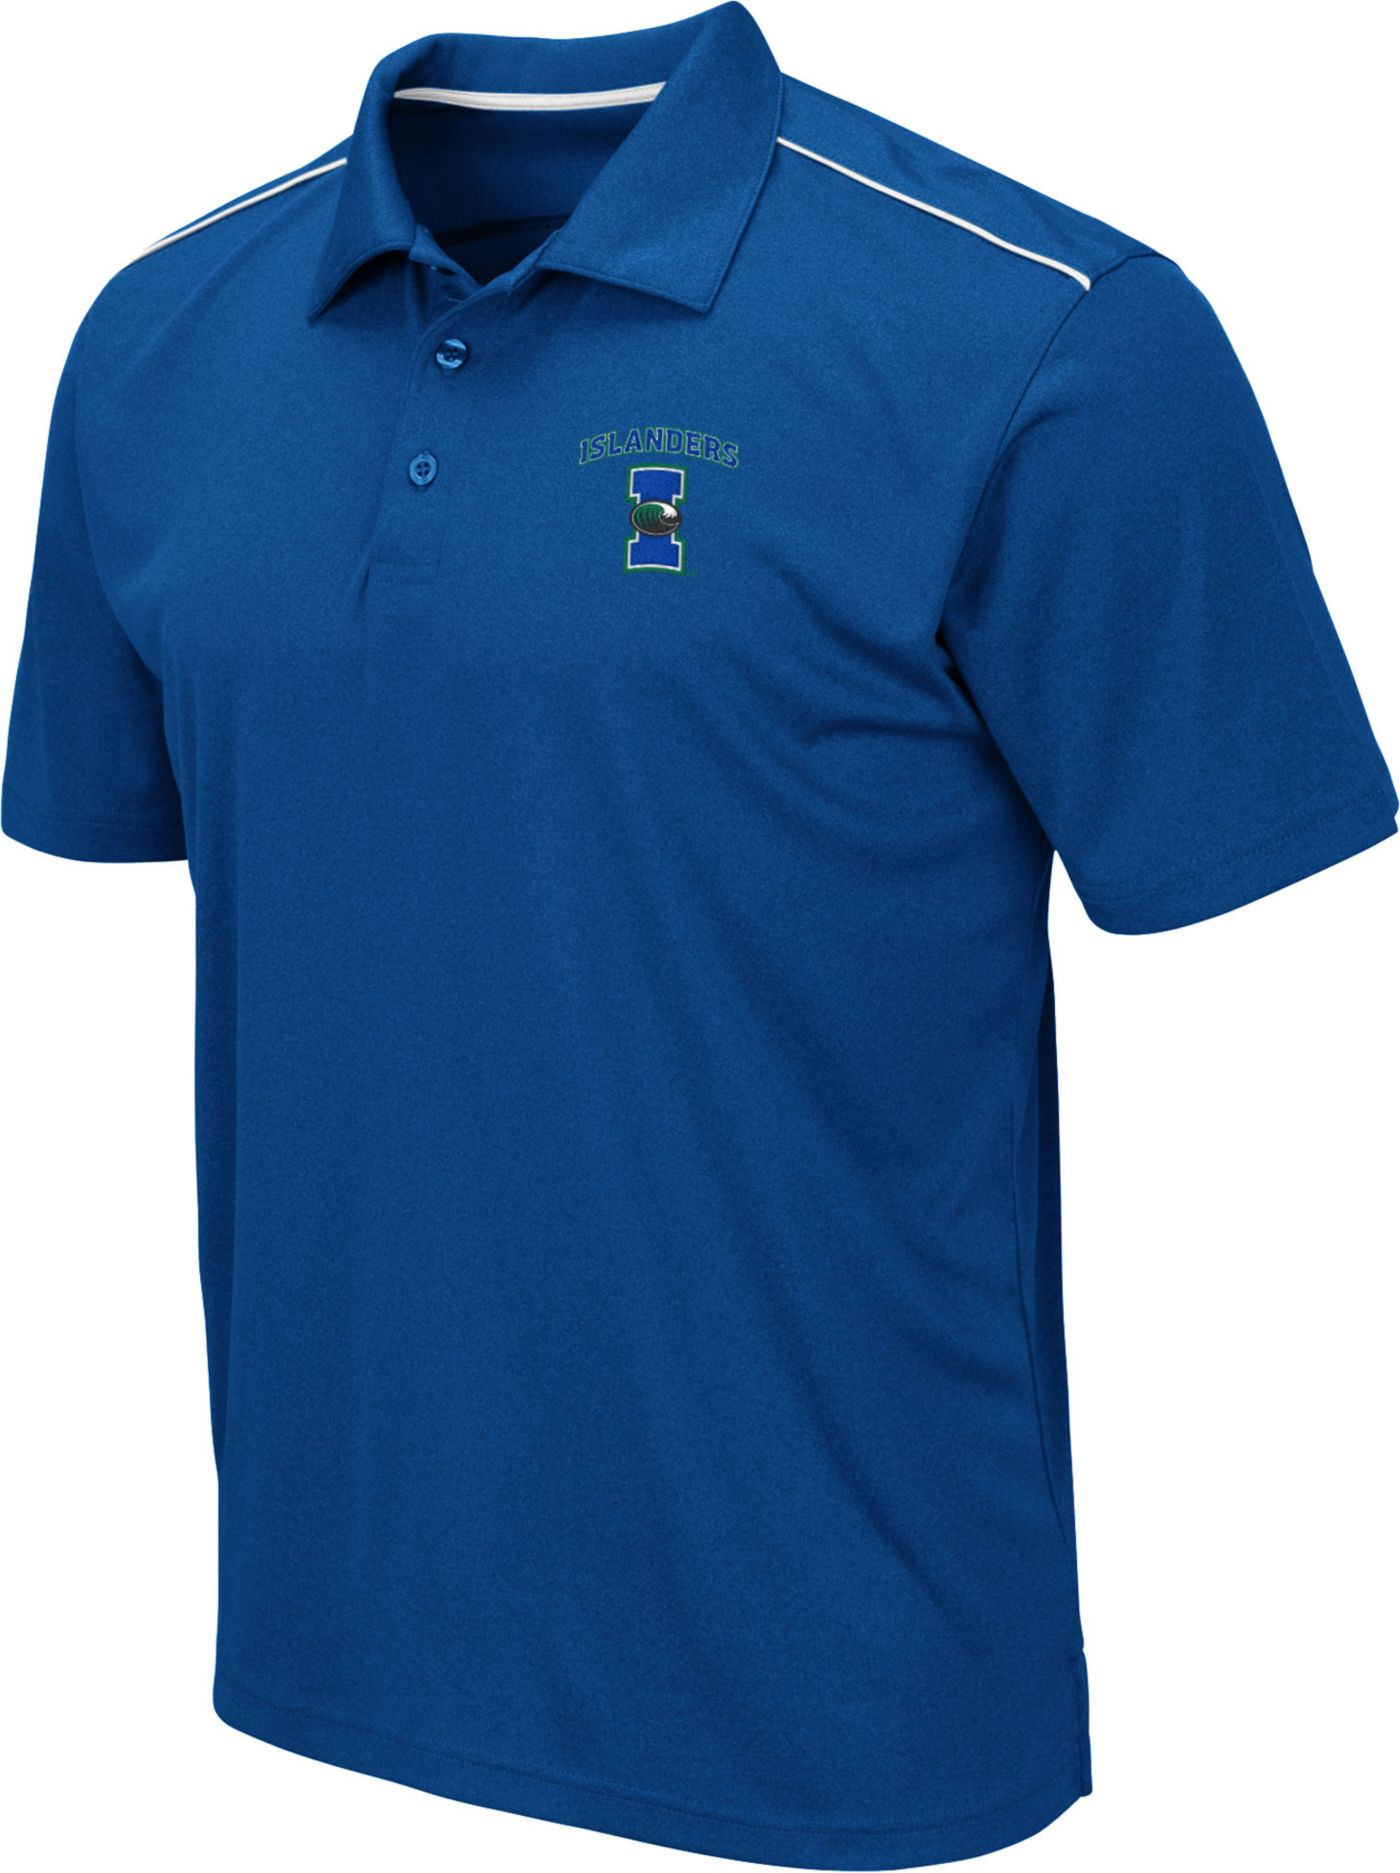 Colosseum Men's Texas A&M -Corpus Christi Islanders Blue Eagle Polo